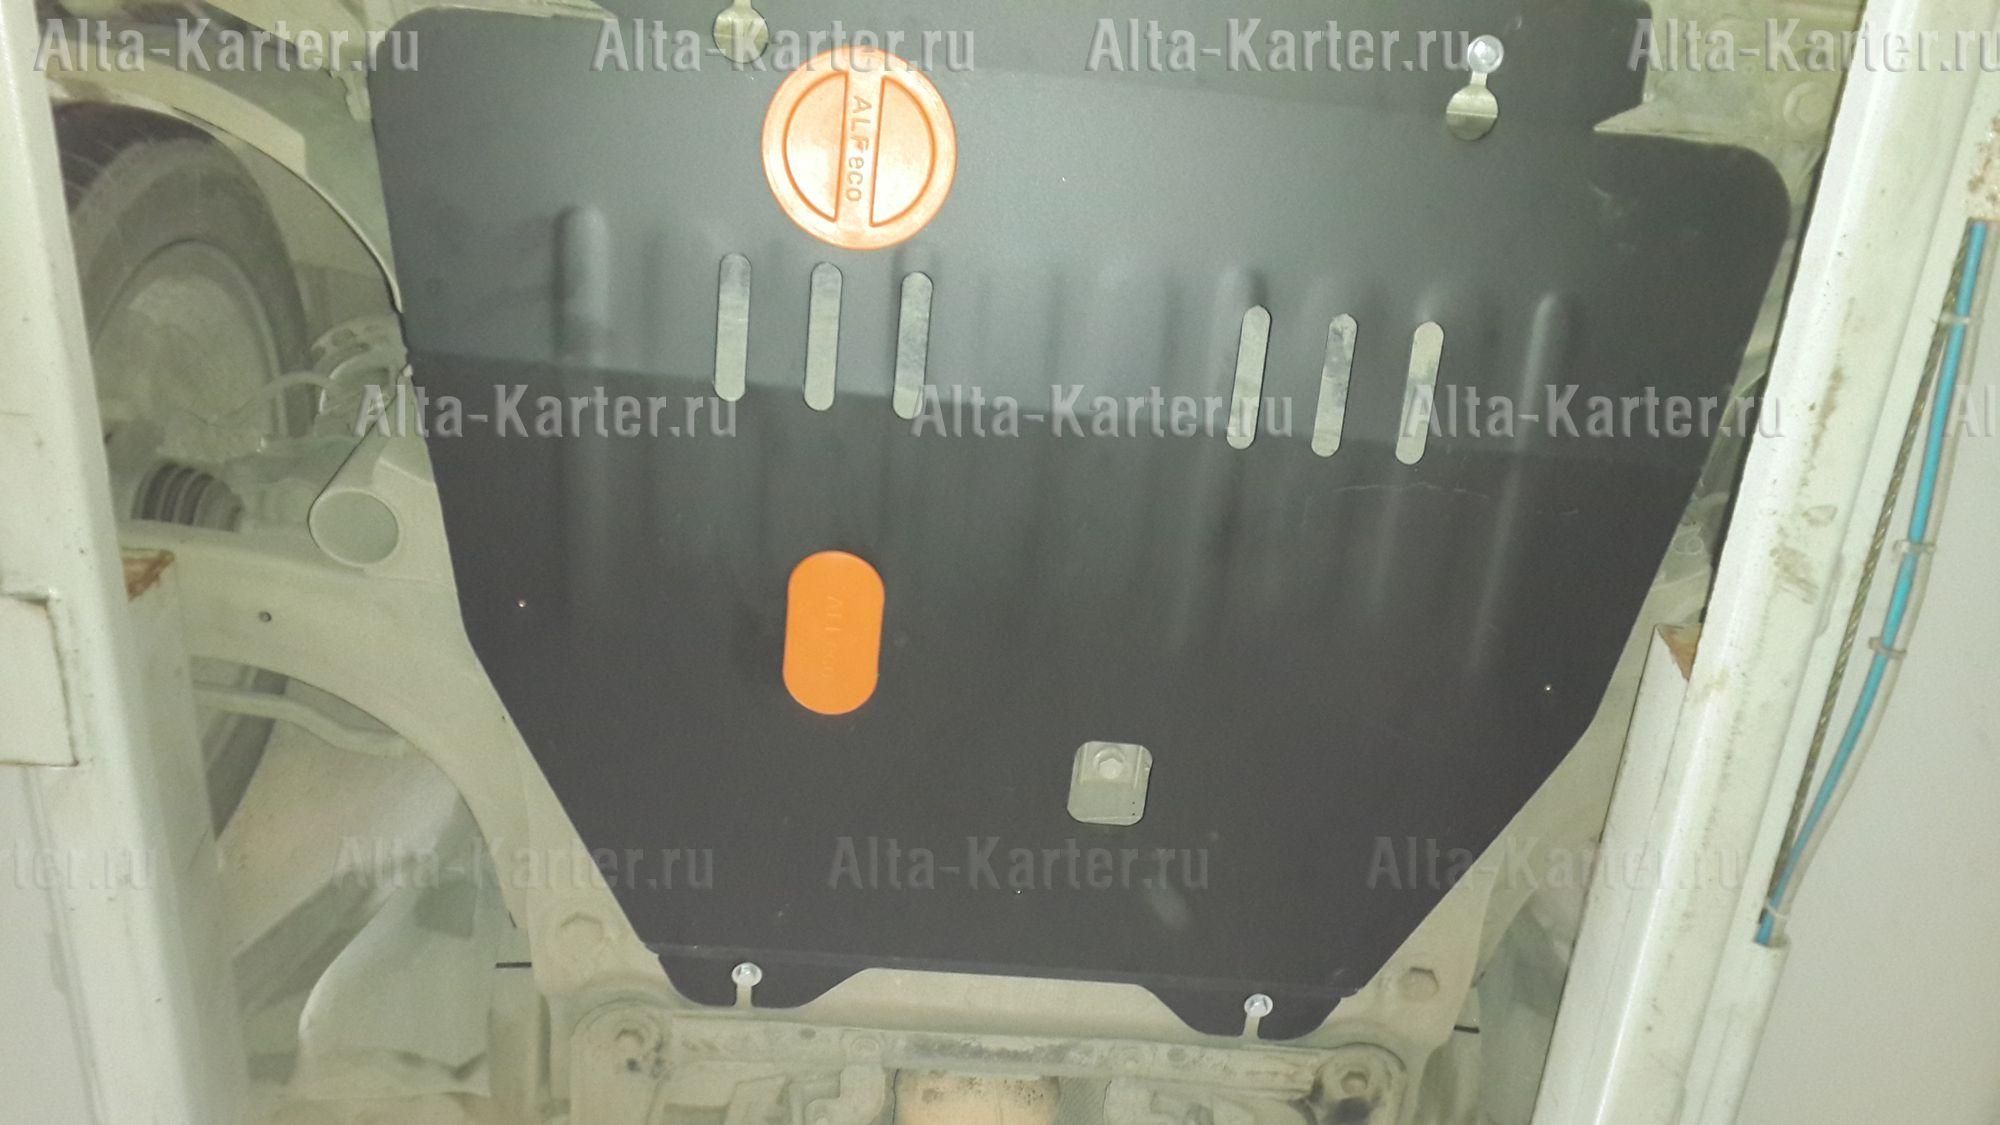 Защита Alfeco для картера и КПП Renault Scenic III 2009-2016. Артикул ALF.18.16